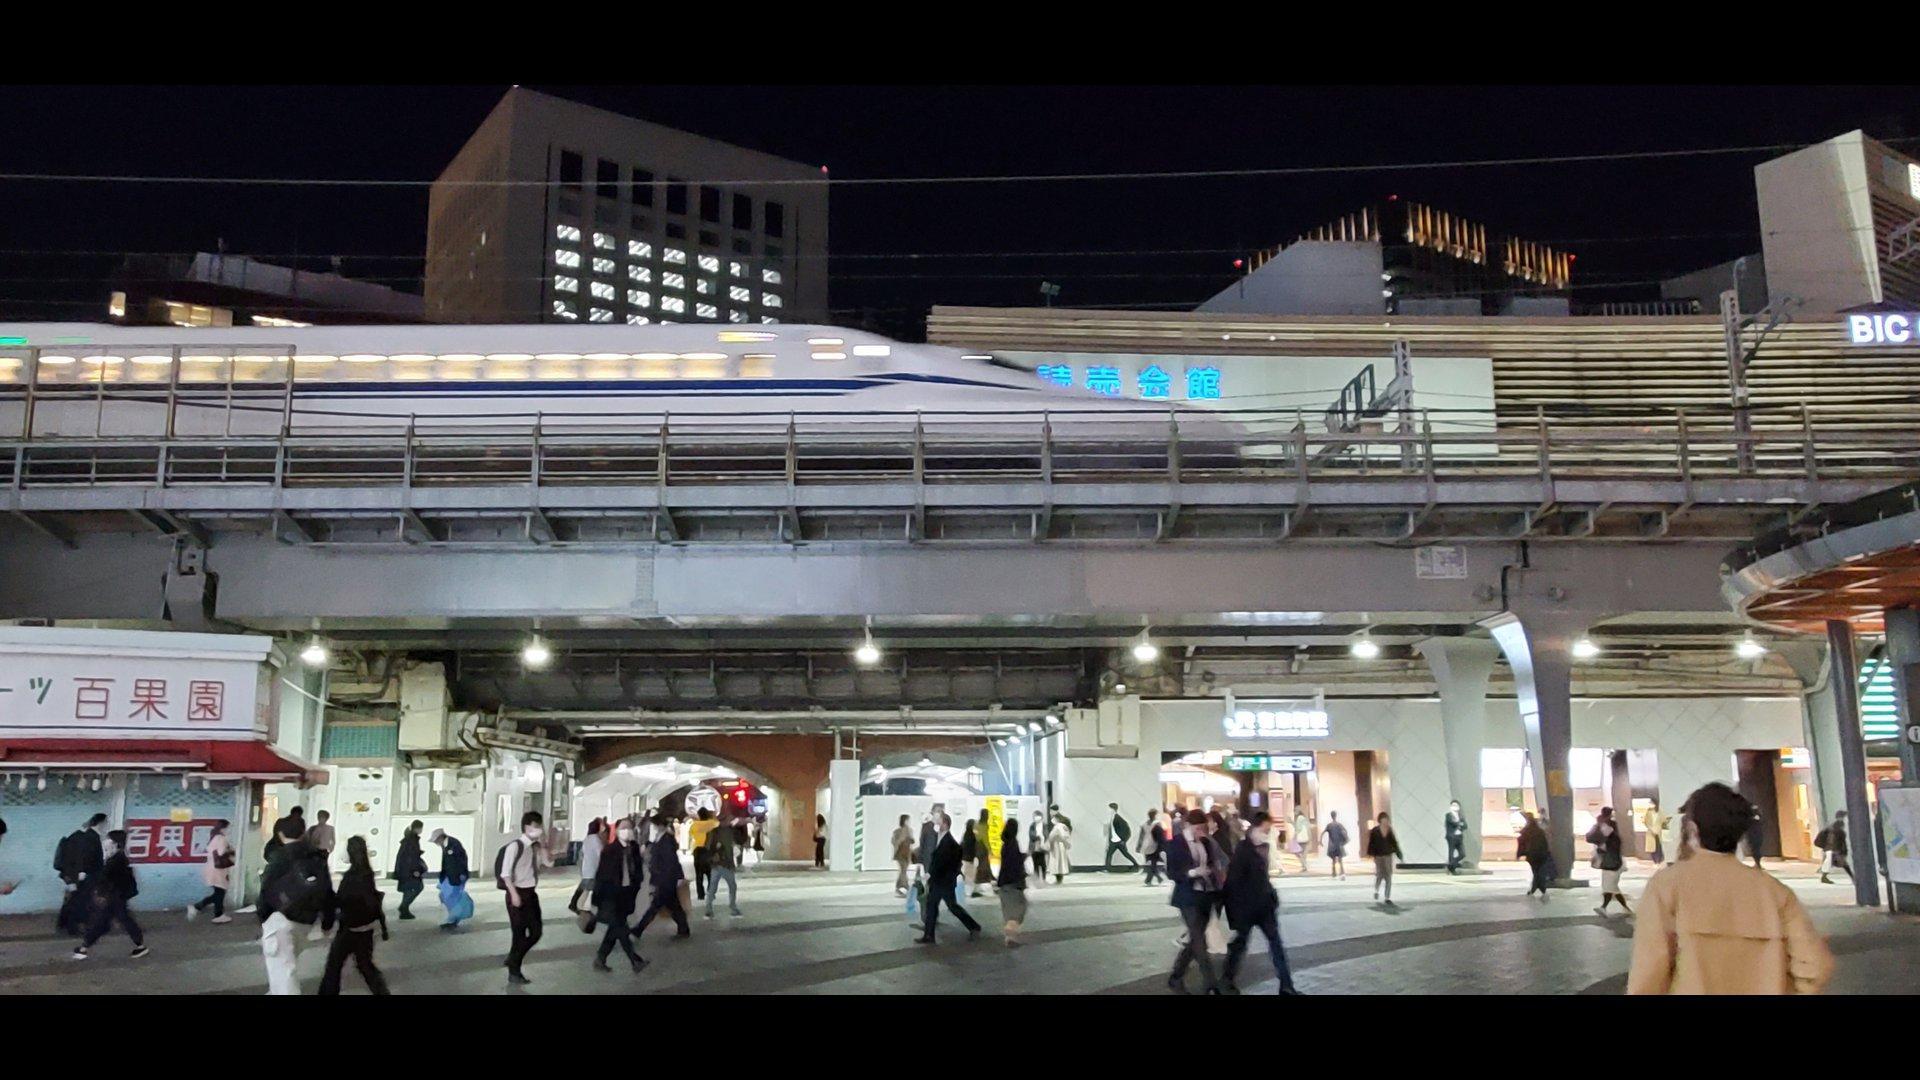 Yūrakuchō Station (有楽町駅(ゆうらくちょう))